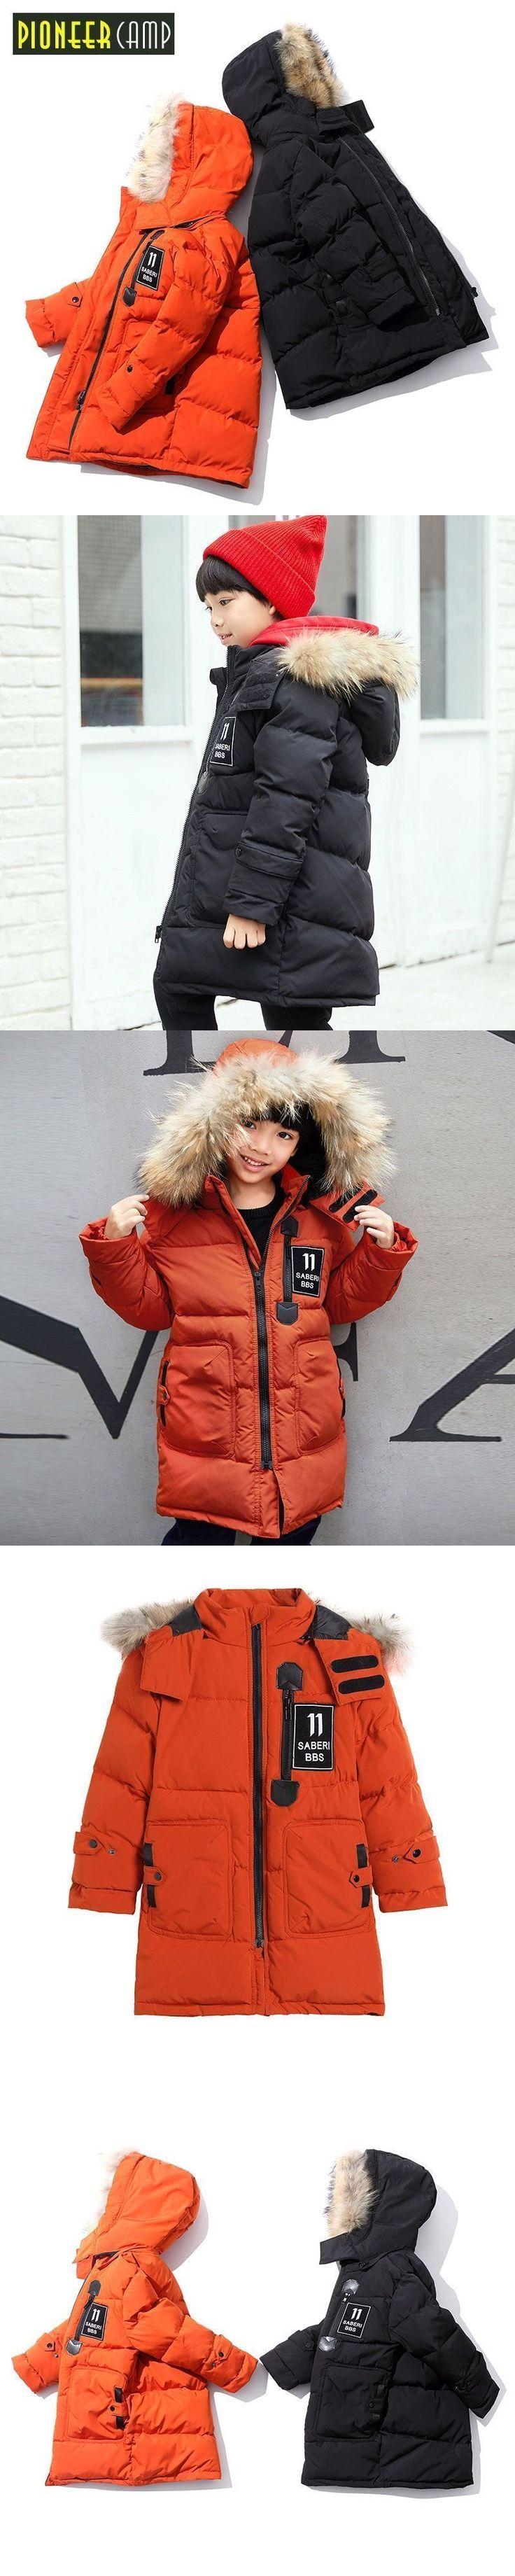 Pioneer Camp Kids Winter Children's Cotton Outerwear&Coats fur collar Boys winter jackets coats Warm baby boys Coat -30 Degrees #babyboycoats #babycoats #babyouterwear